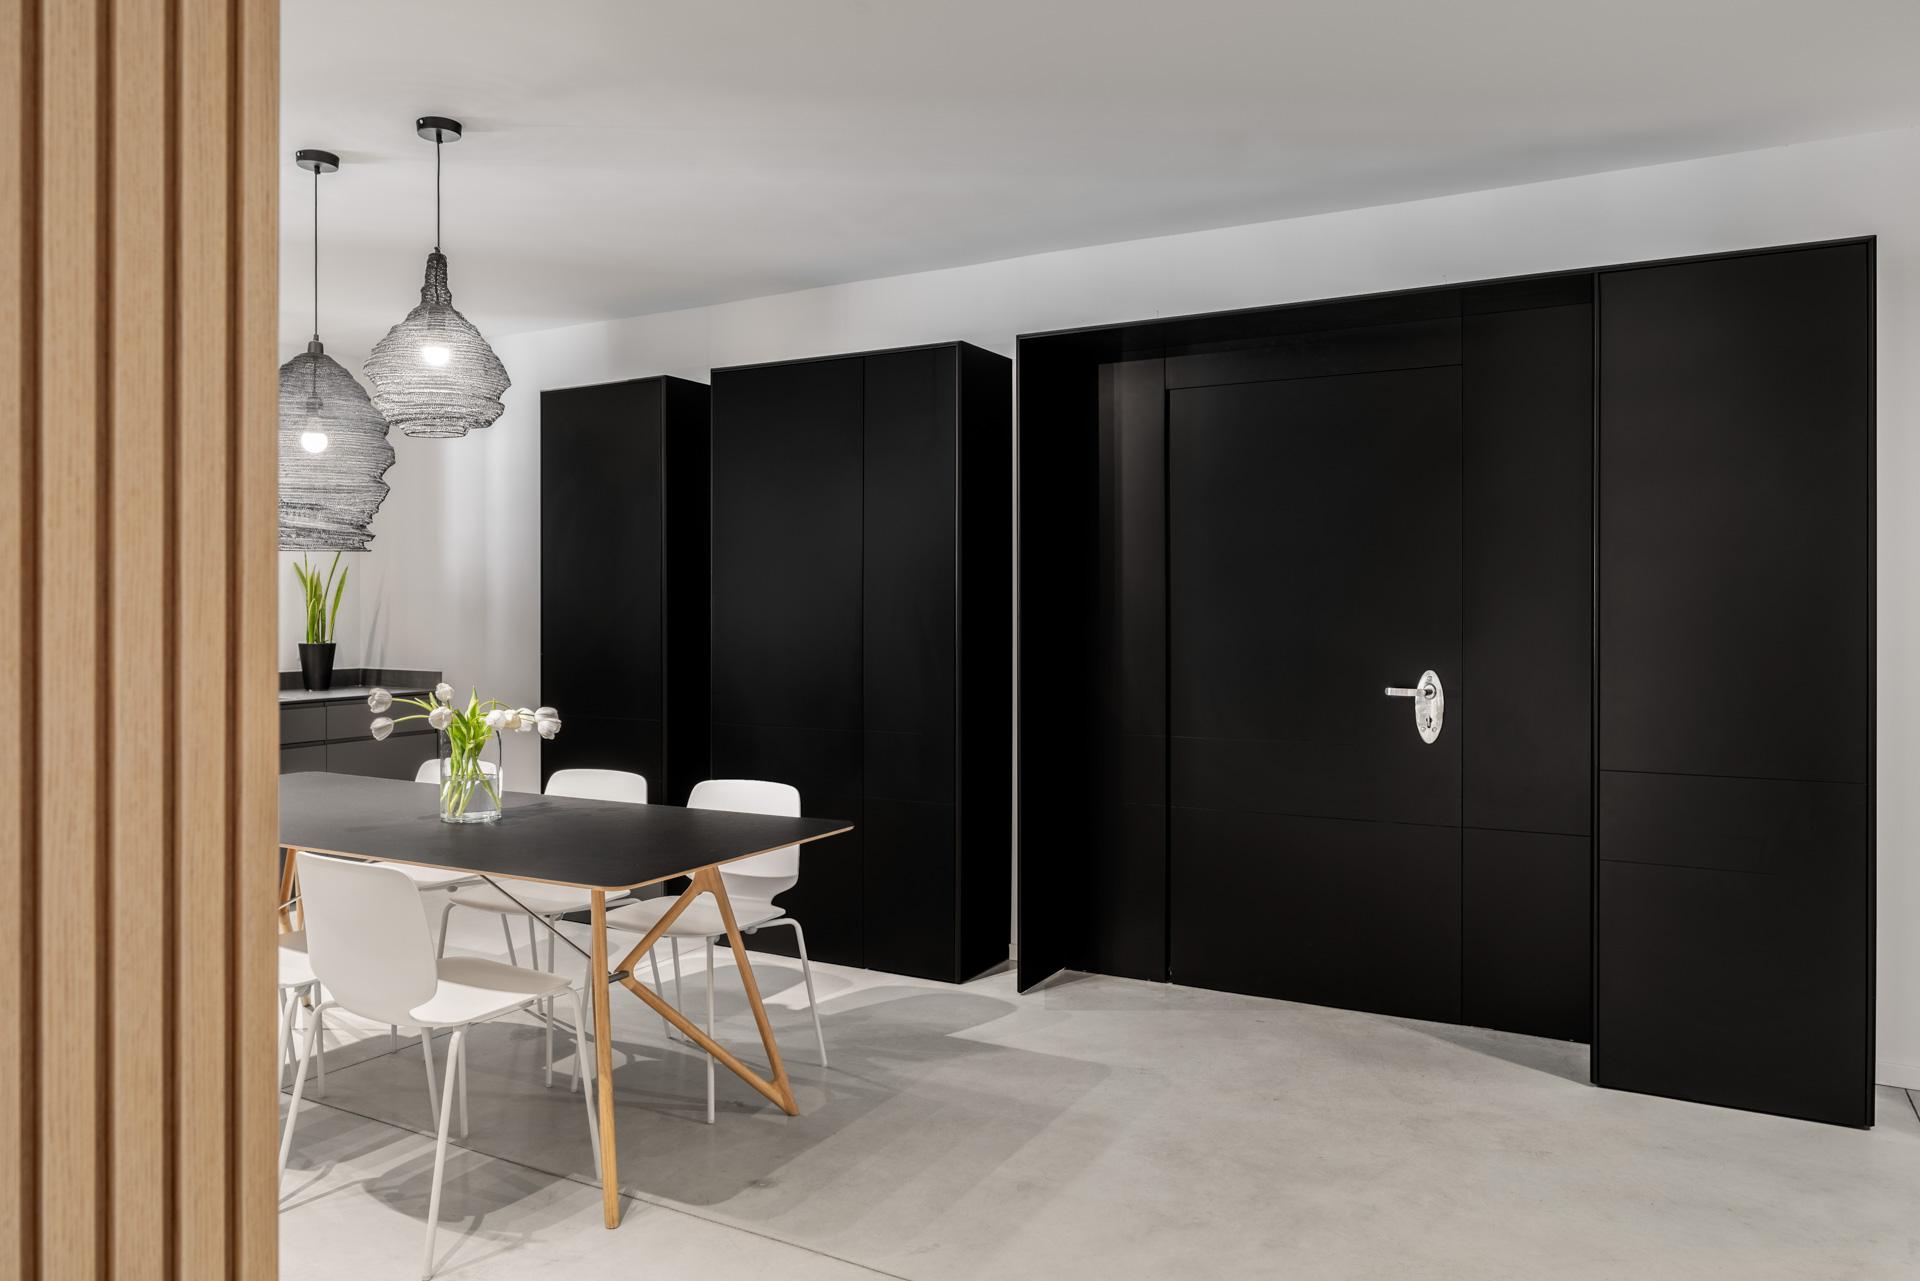 Peled-Studios-Two-Apartments_-83-HDR-copy-1